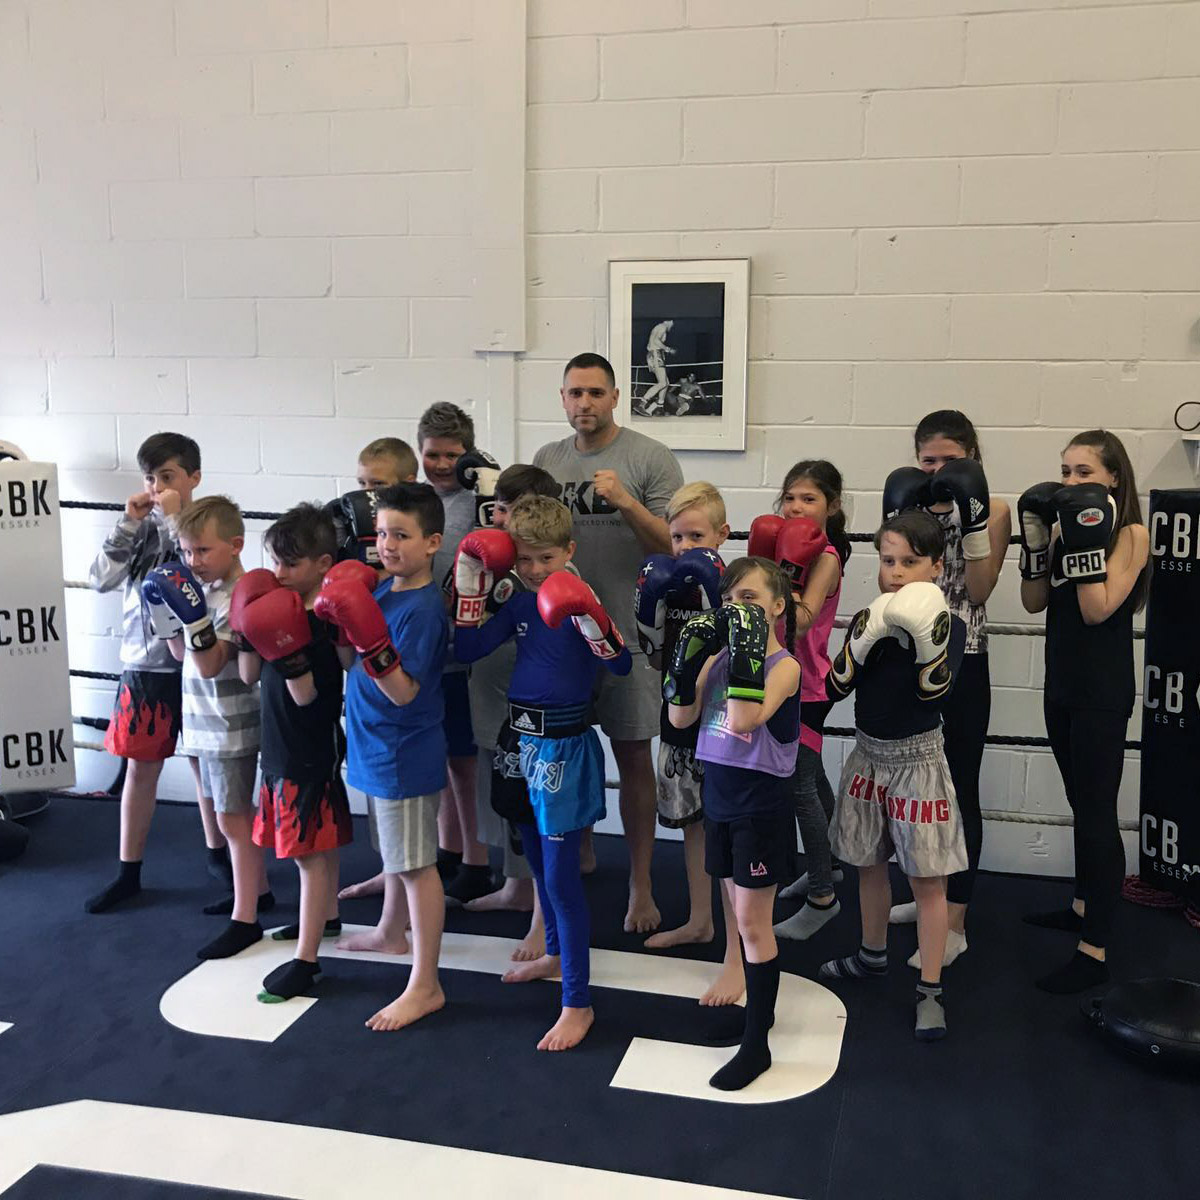 Kids Boxing Cbk Essex